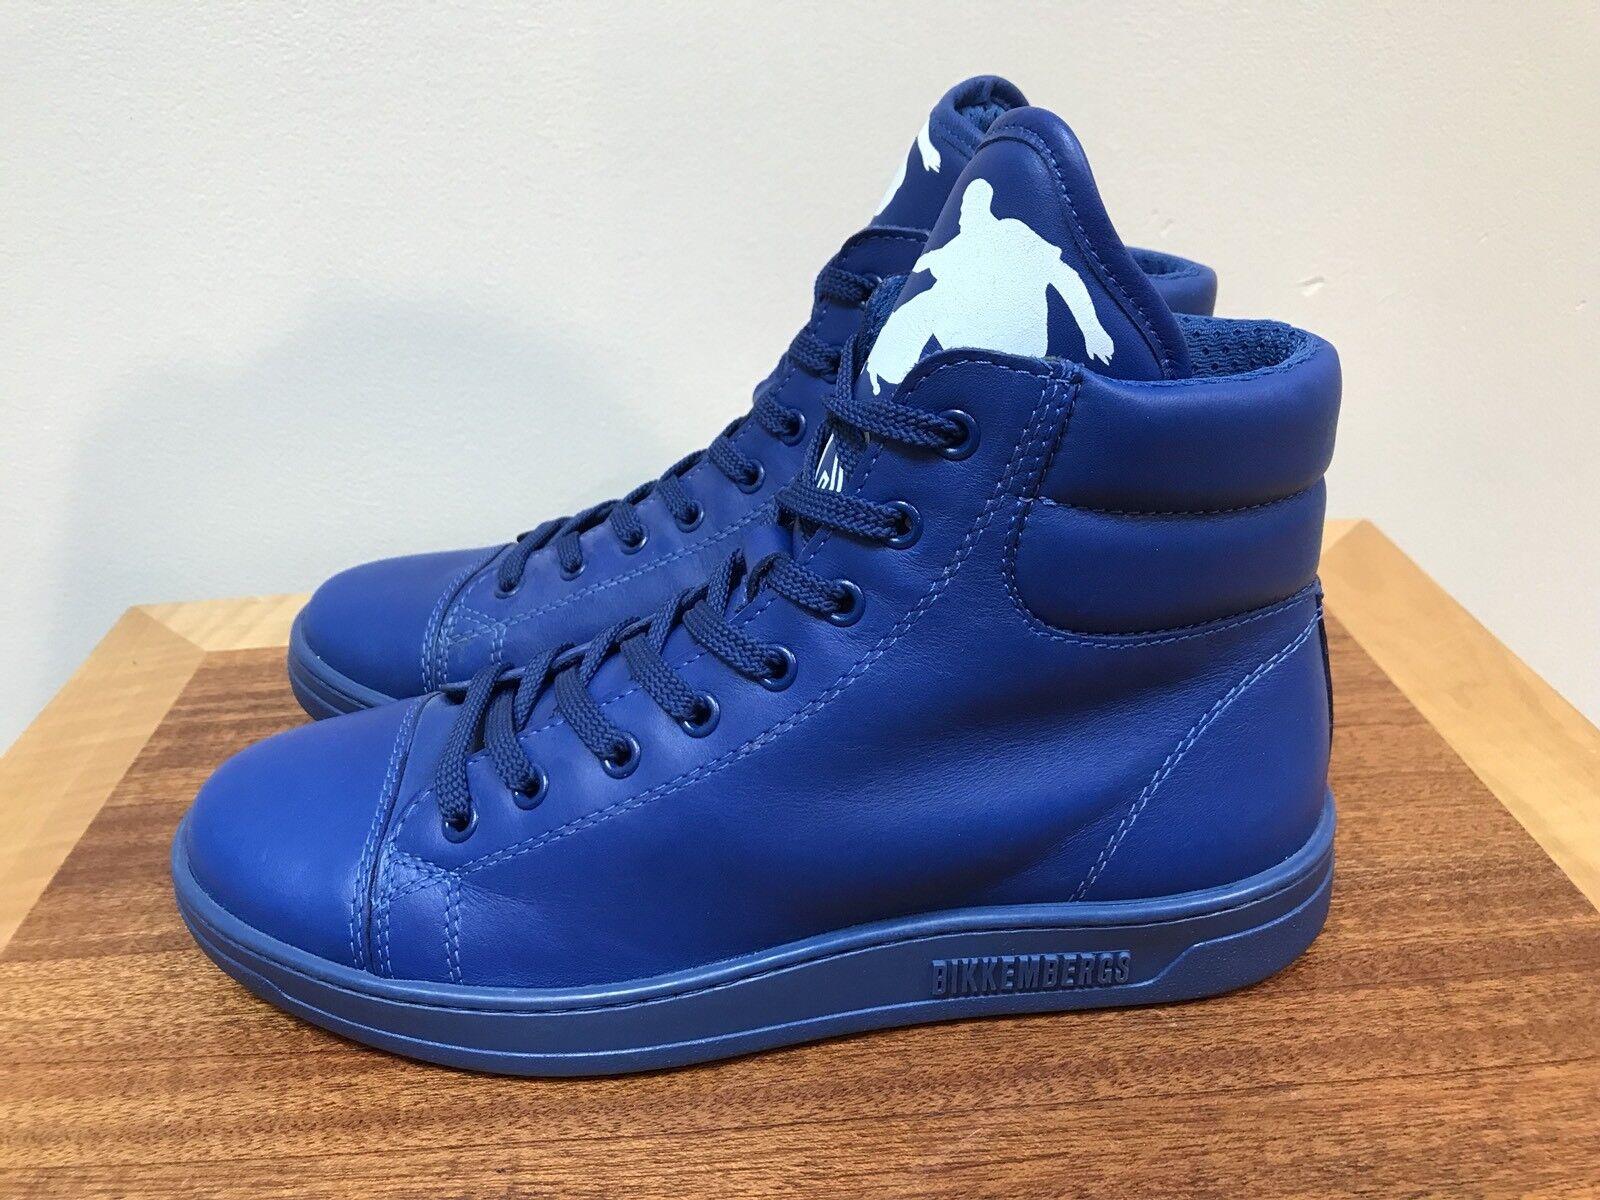 NEW Bikkembergs BikkSK8 Zip High Tops Athletic scarpe ELECTRIC ELECTRIC ELECTRIC blu Dimensione 37 098400